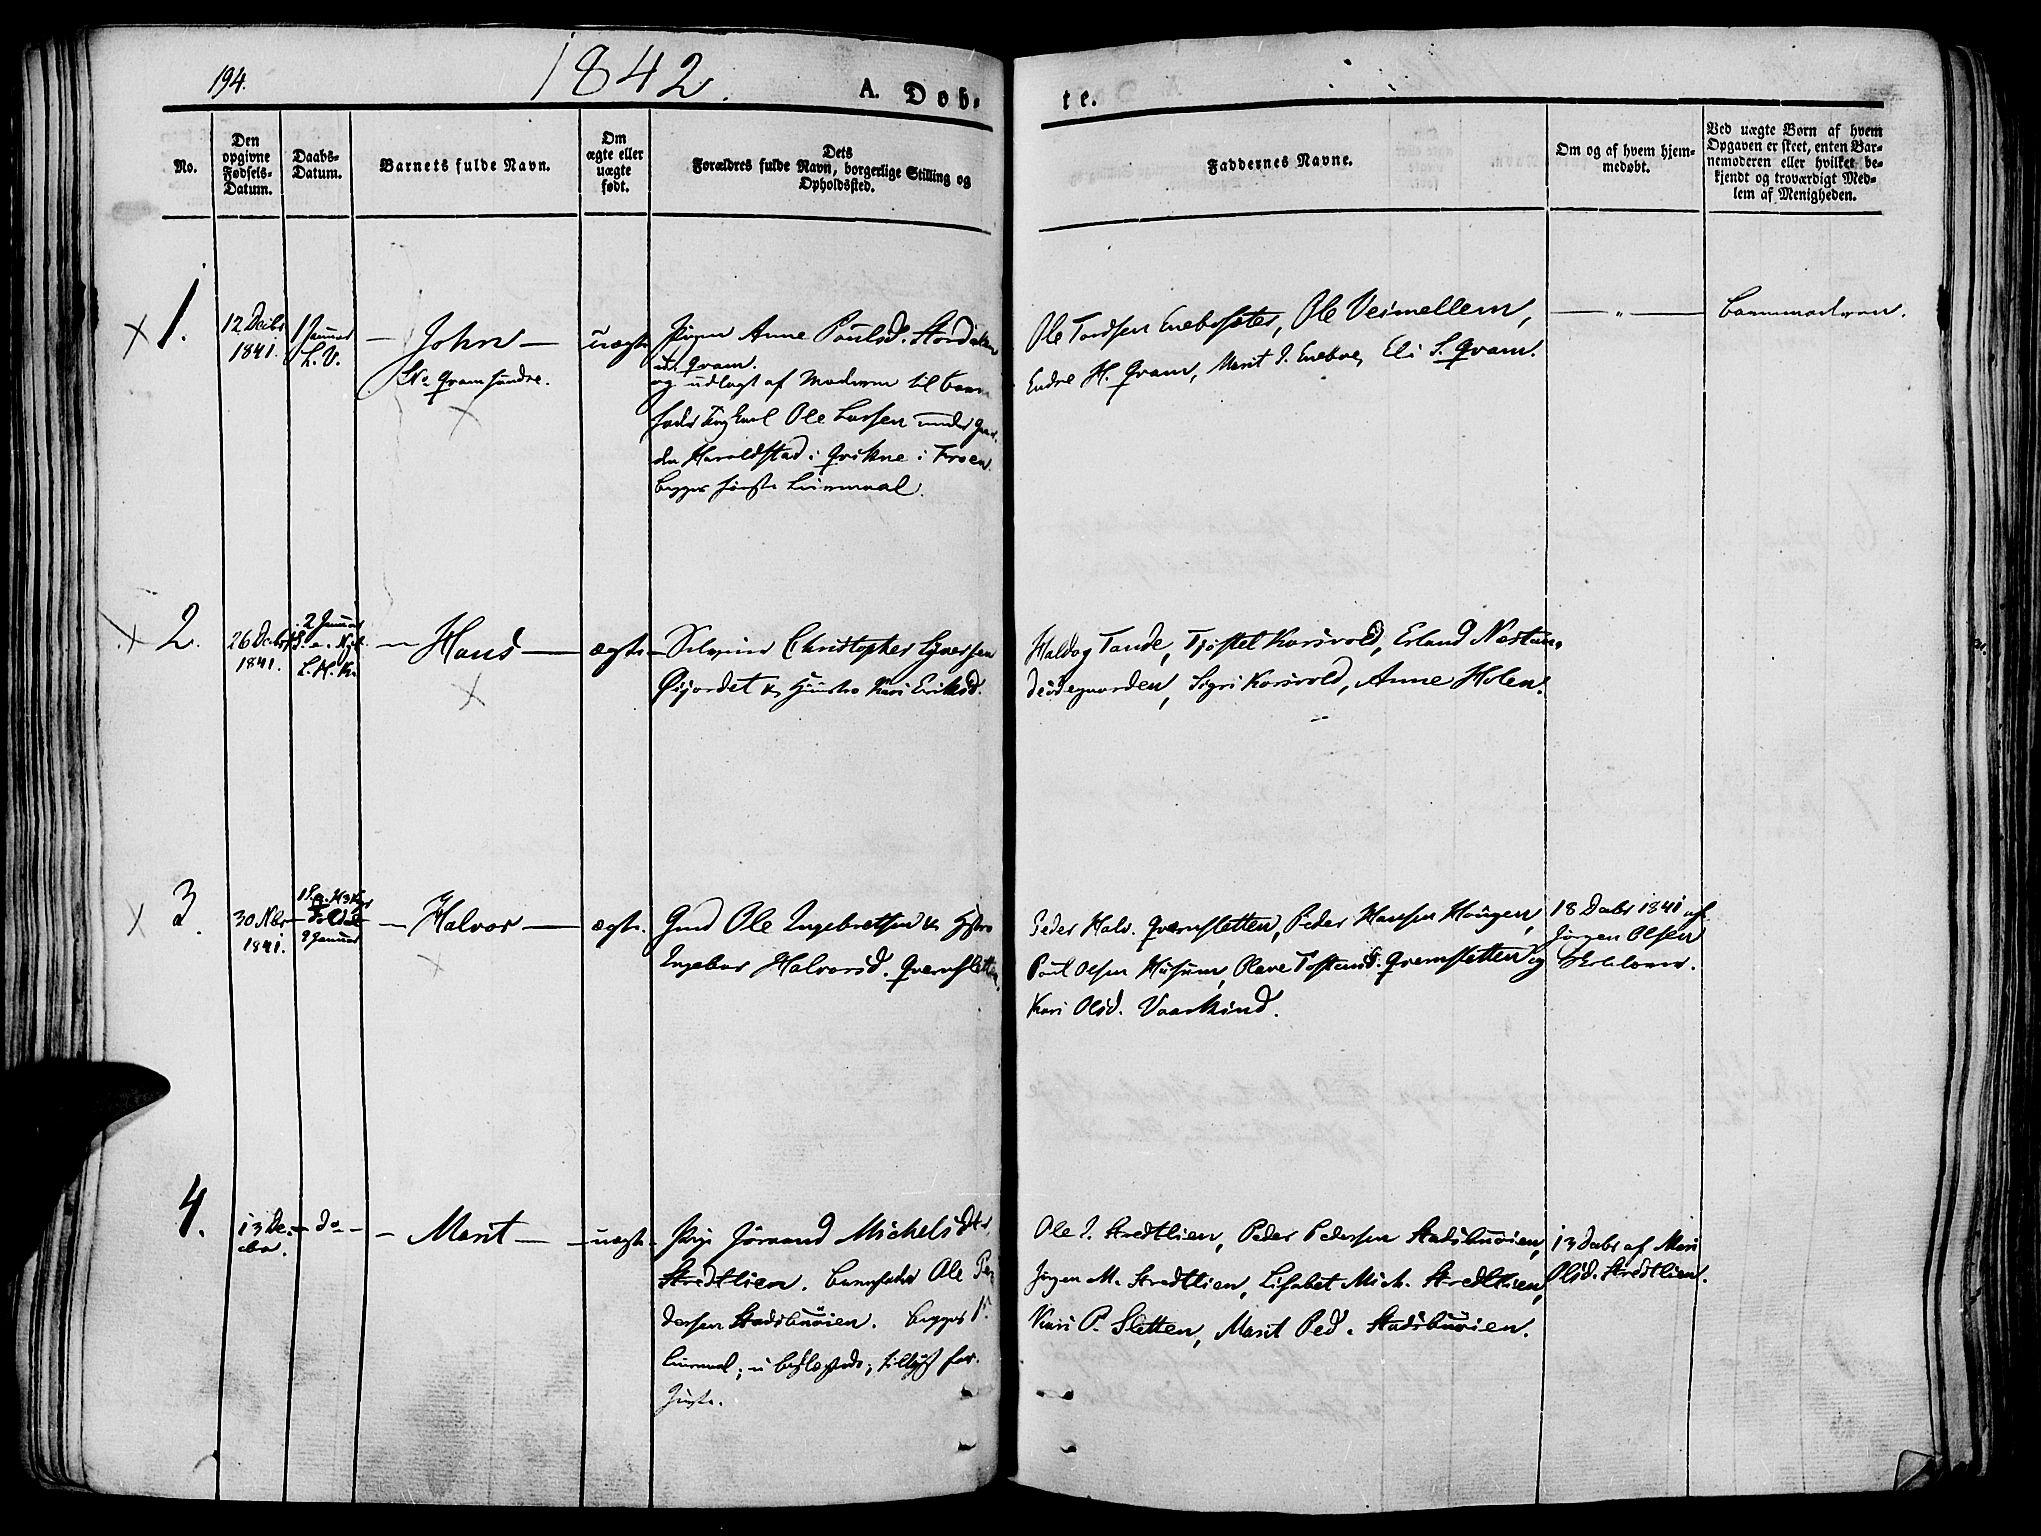 SAH, Lesja prestekontor, Ministerialbok nr. 5, 1830-1842, s. 194